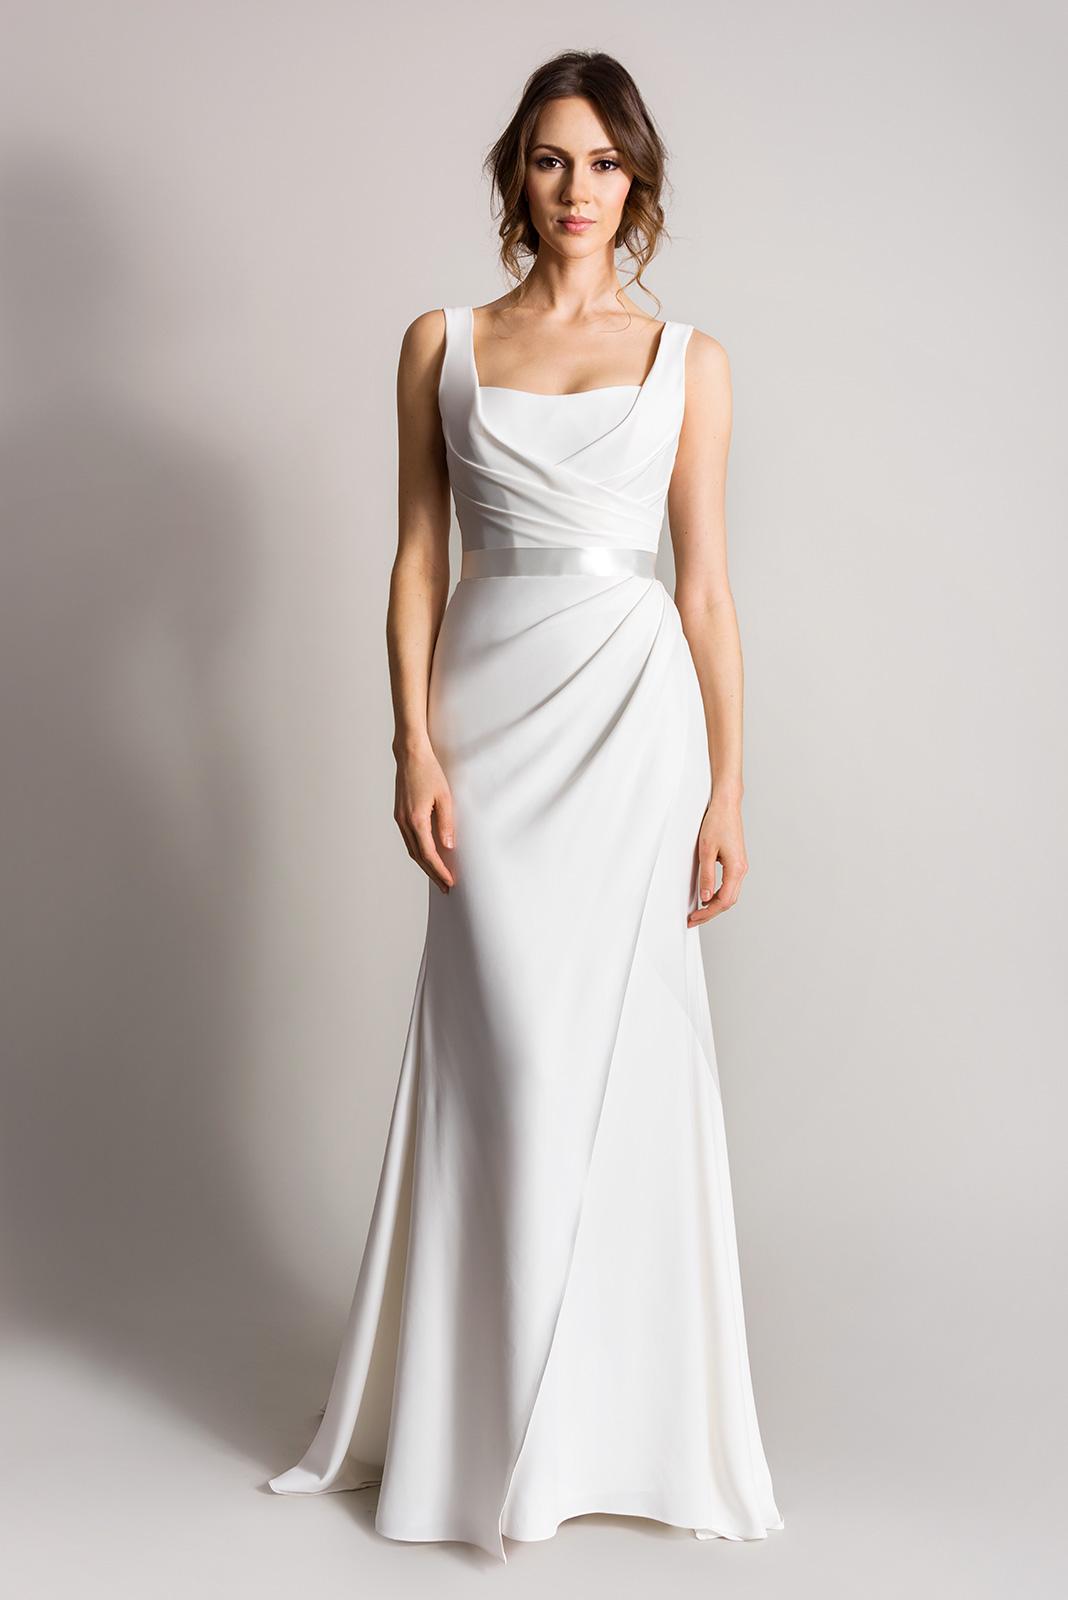 Sleek And Minimalist Wedding Dresses For Modern Brides